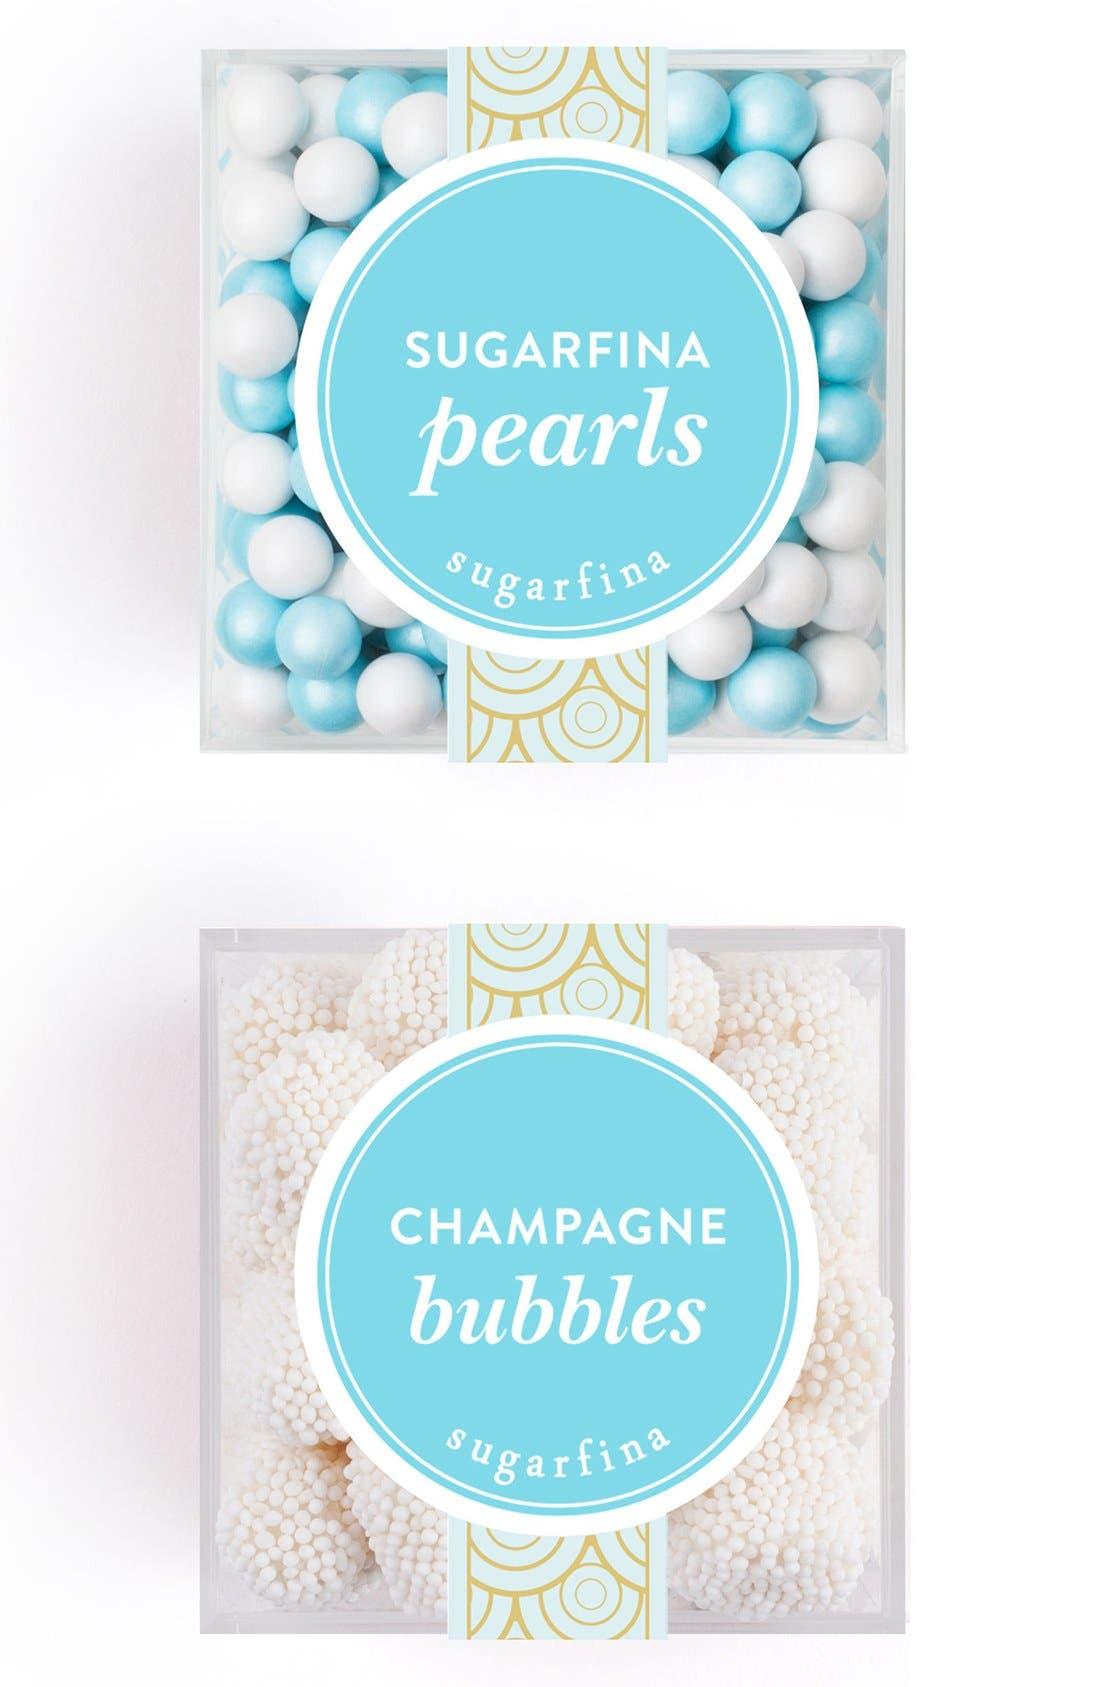 Pearls & Champagne Bubbles Gift Box Set,                             Main thumbnail 1, color,                             Blue